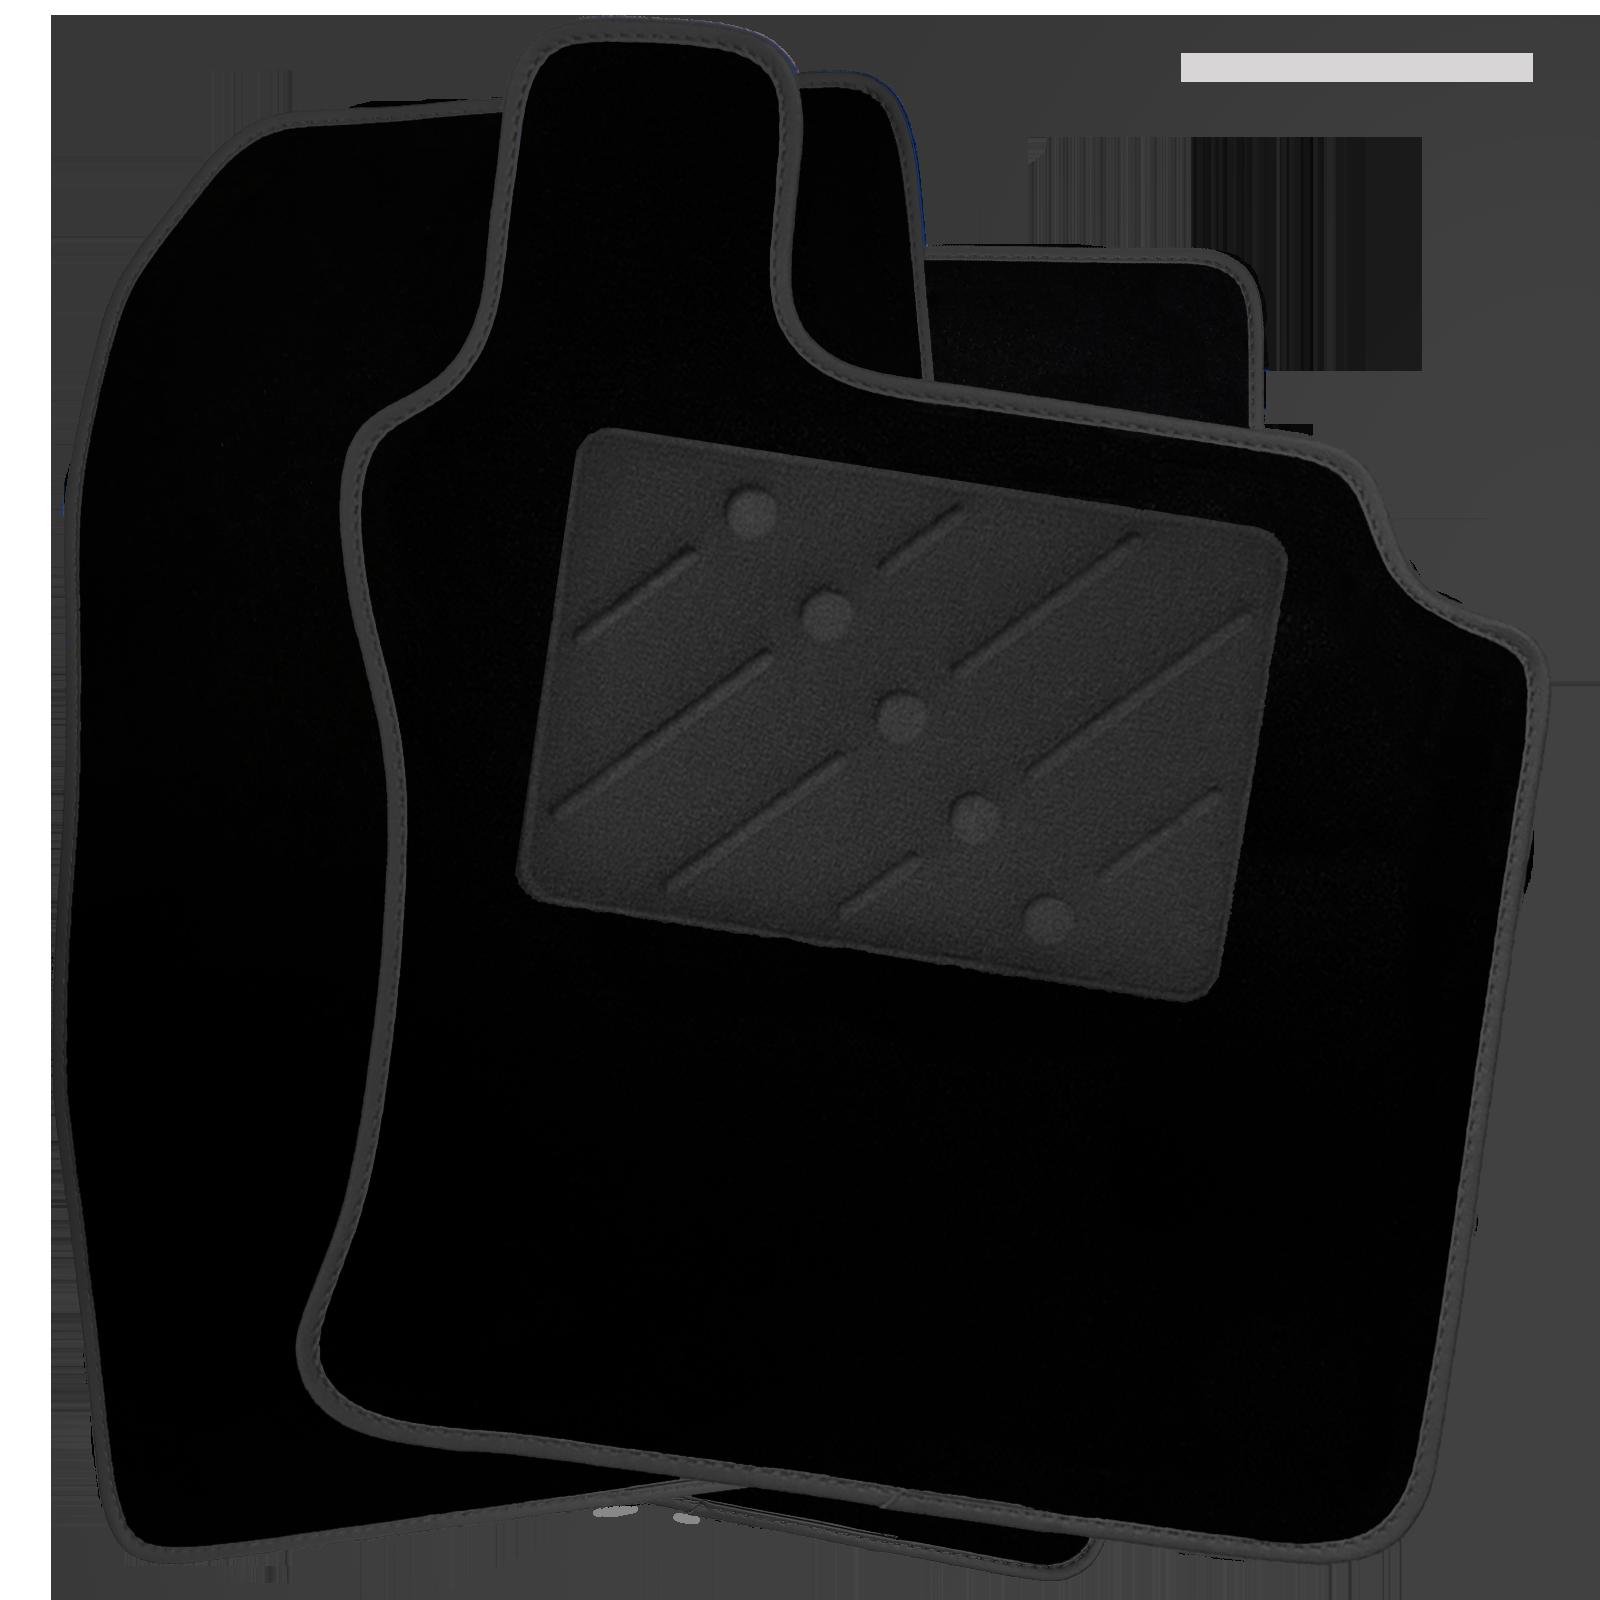 FIAT PUNTO EVO 2010 FULLY TAILORED CAR MATS BLACK CARPET WITH WHITE EDGING